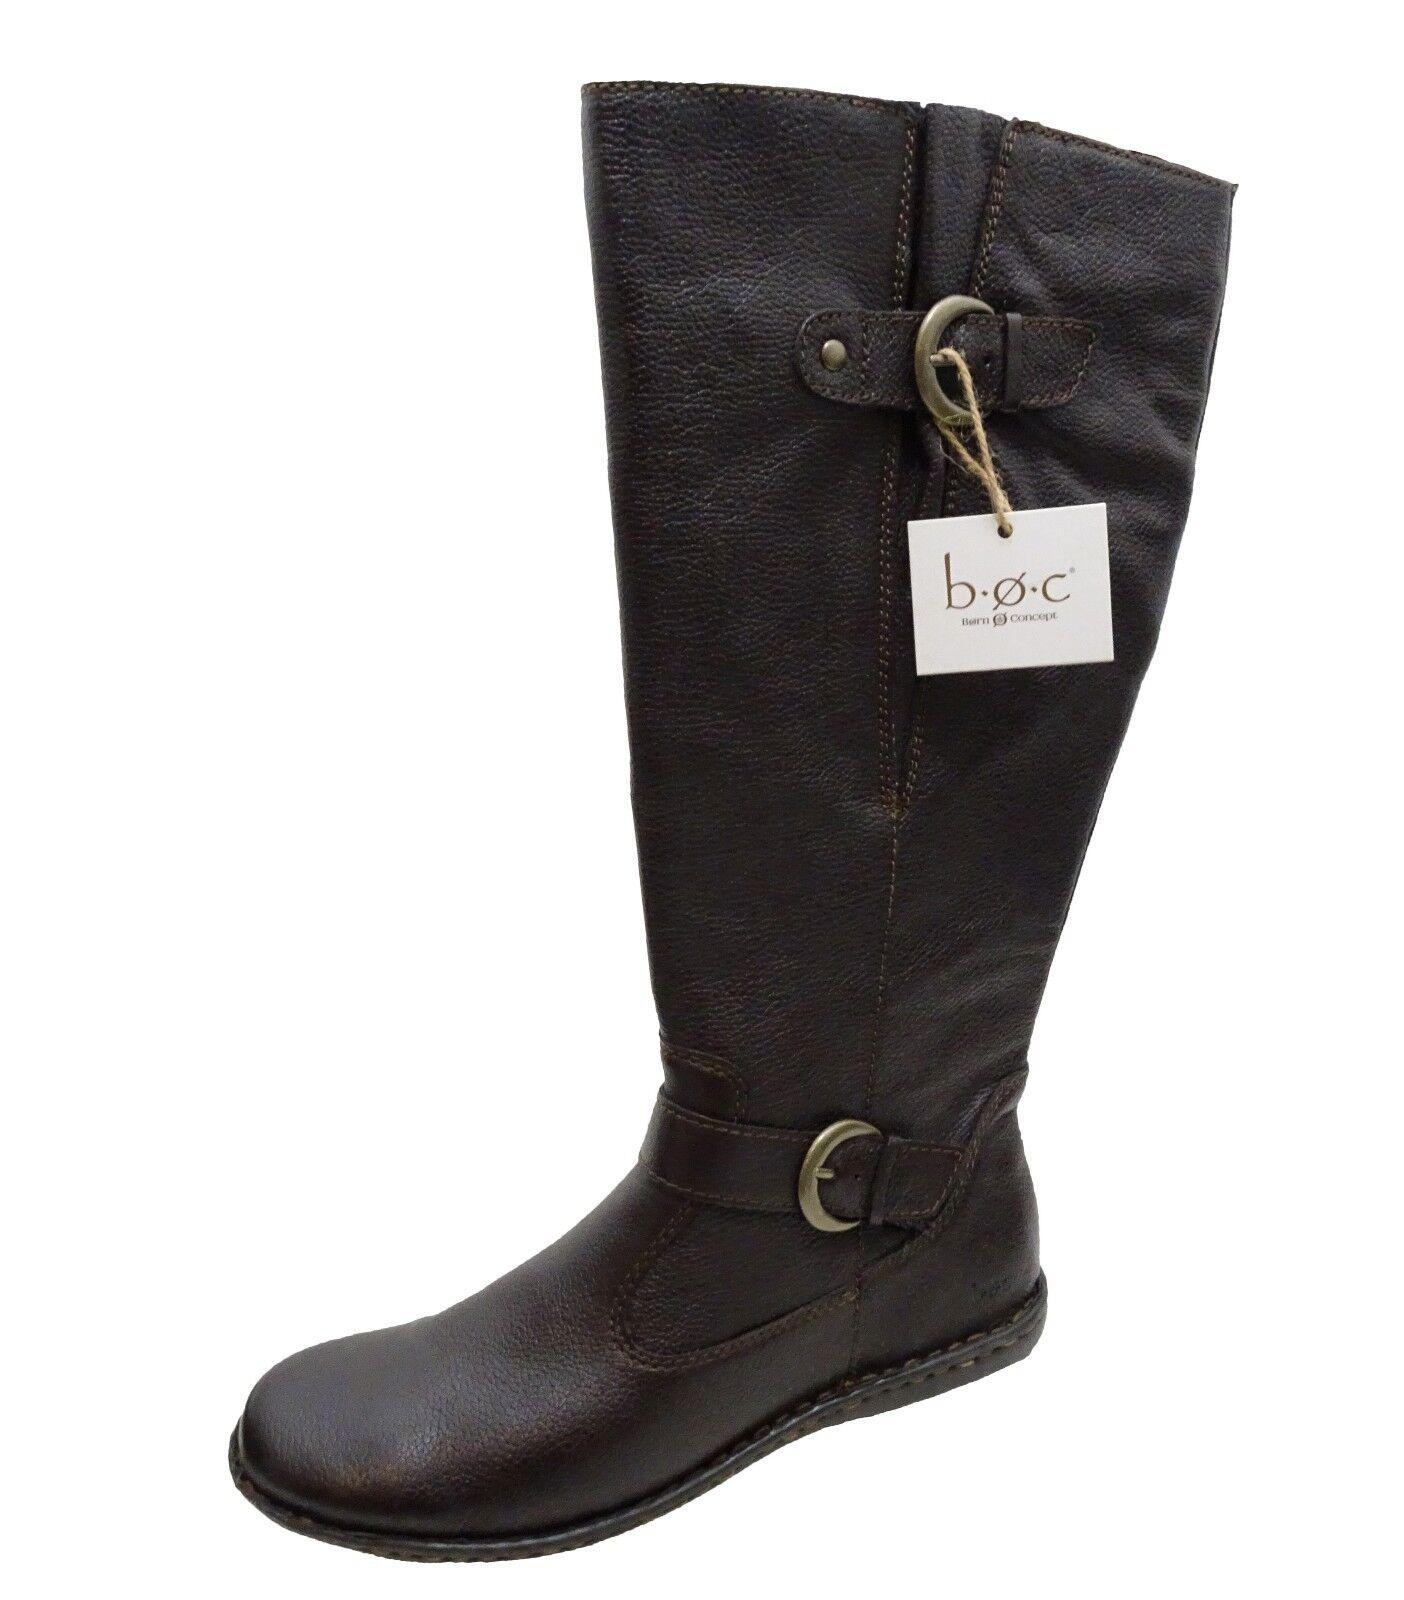 B.O.C Womens Faye Pull On Tall Knee High Strap Buckle Inside Zip Fashion Boots